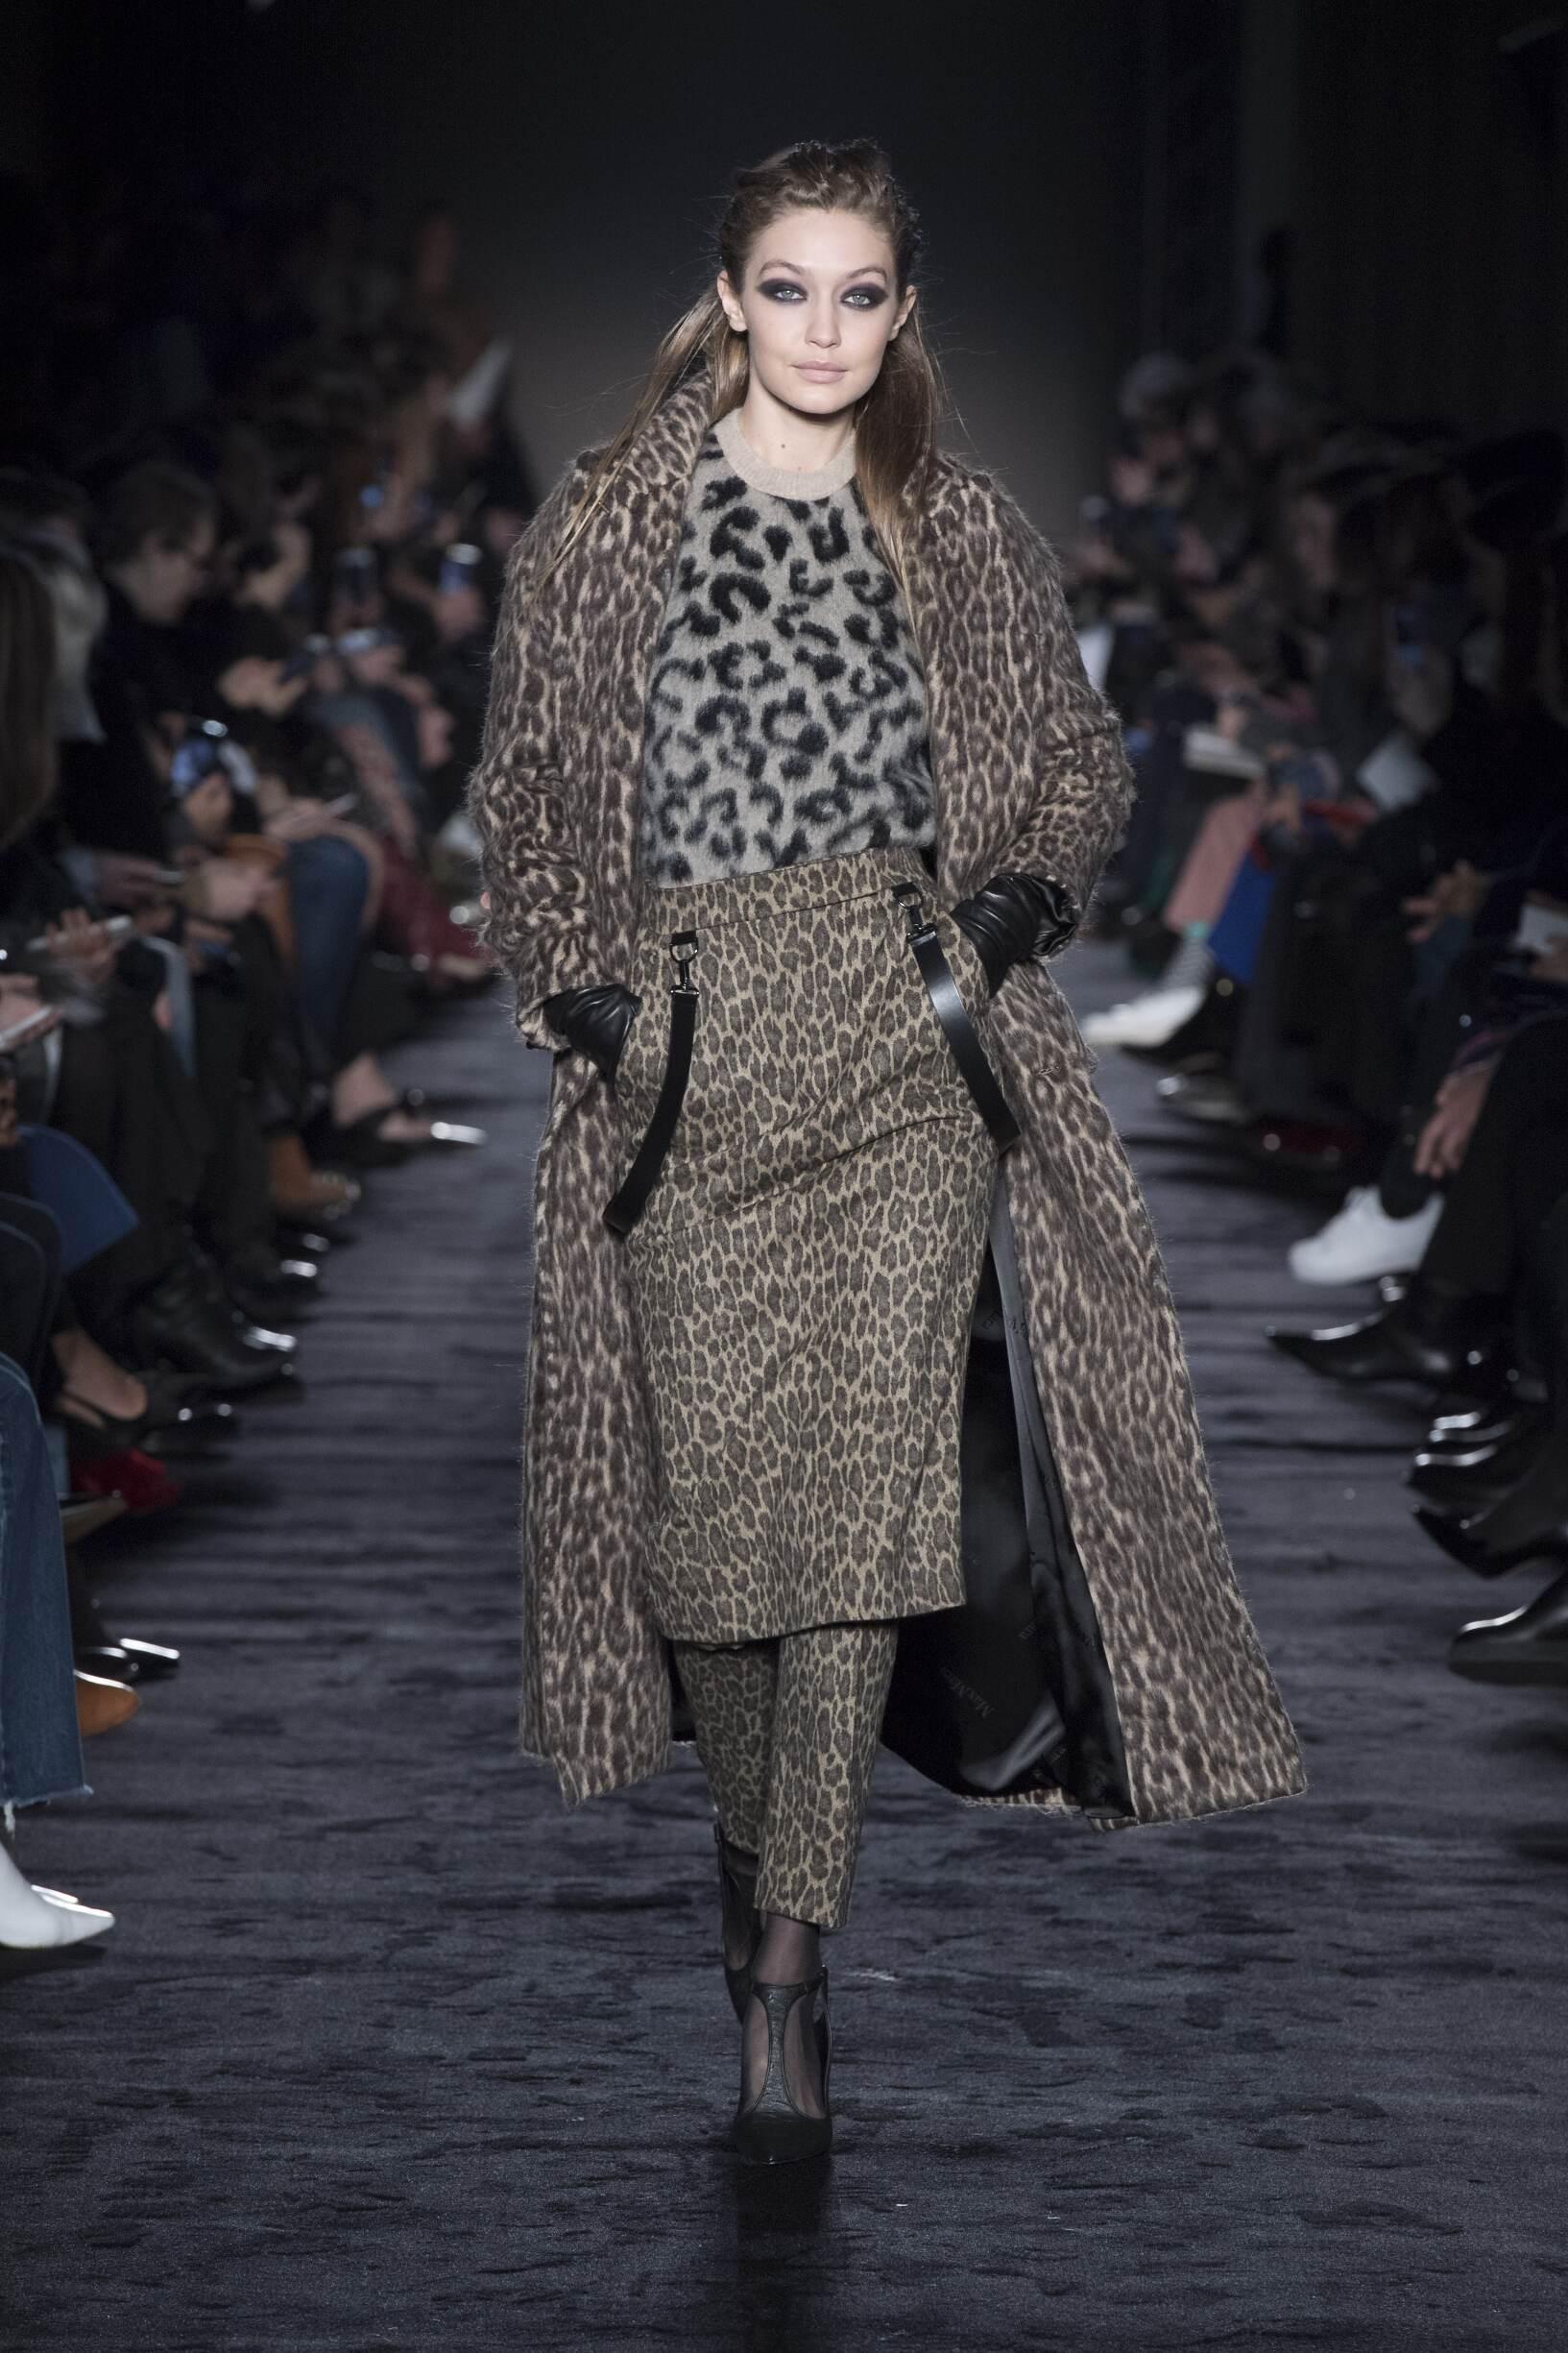 Model Fashion Show Max Mara